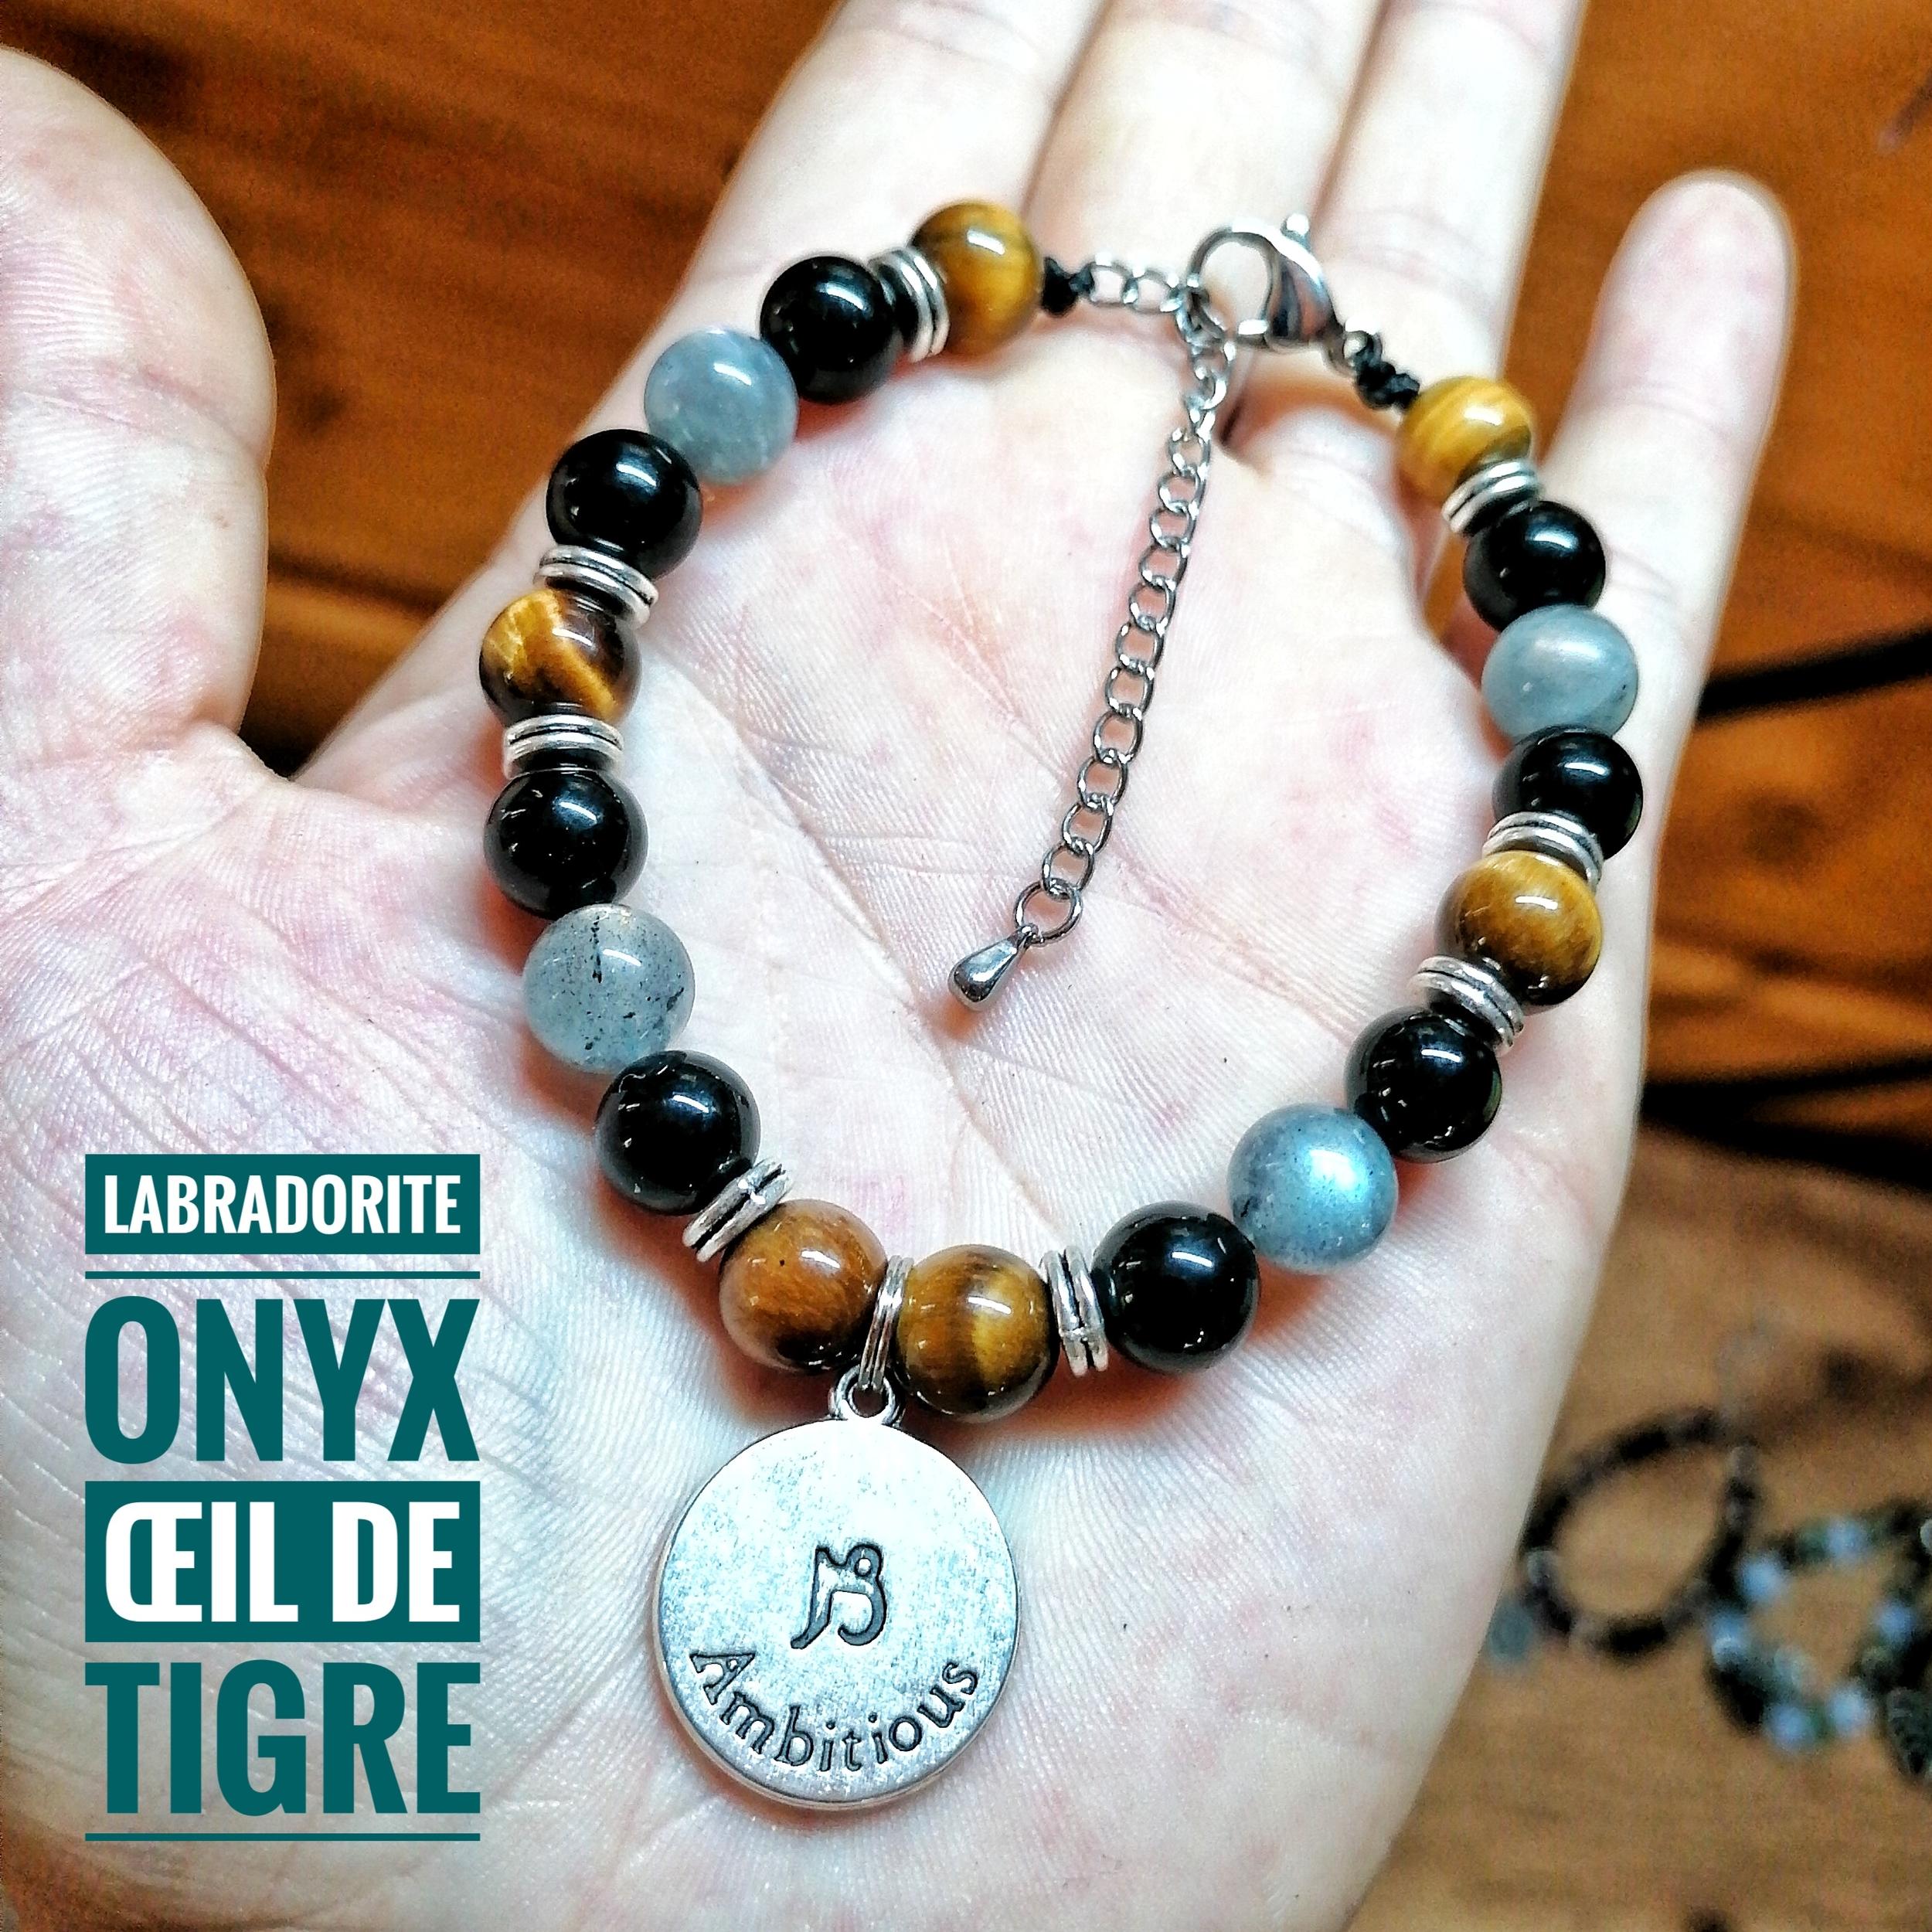 Bracelet spécial Capricorne ♑ en Labradorite, Onyx & Oeil de tigre